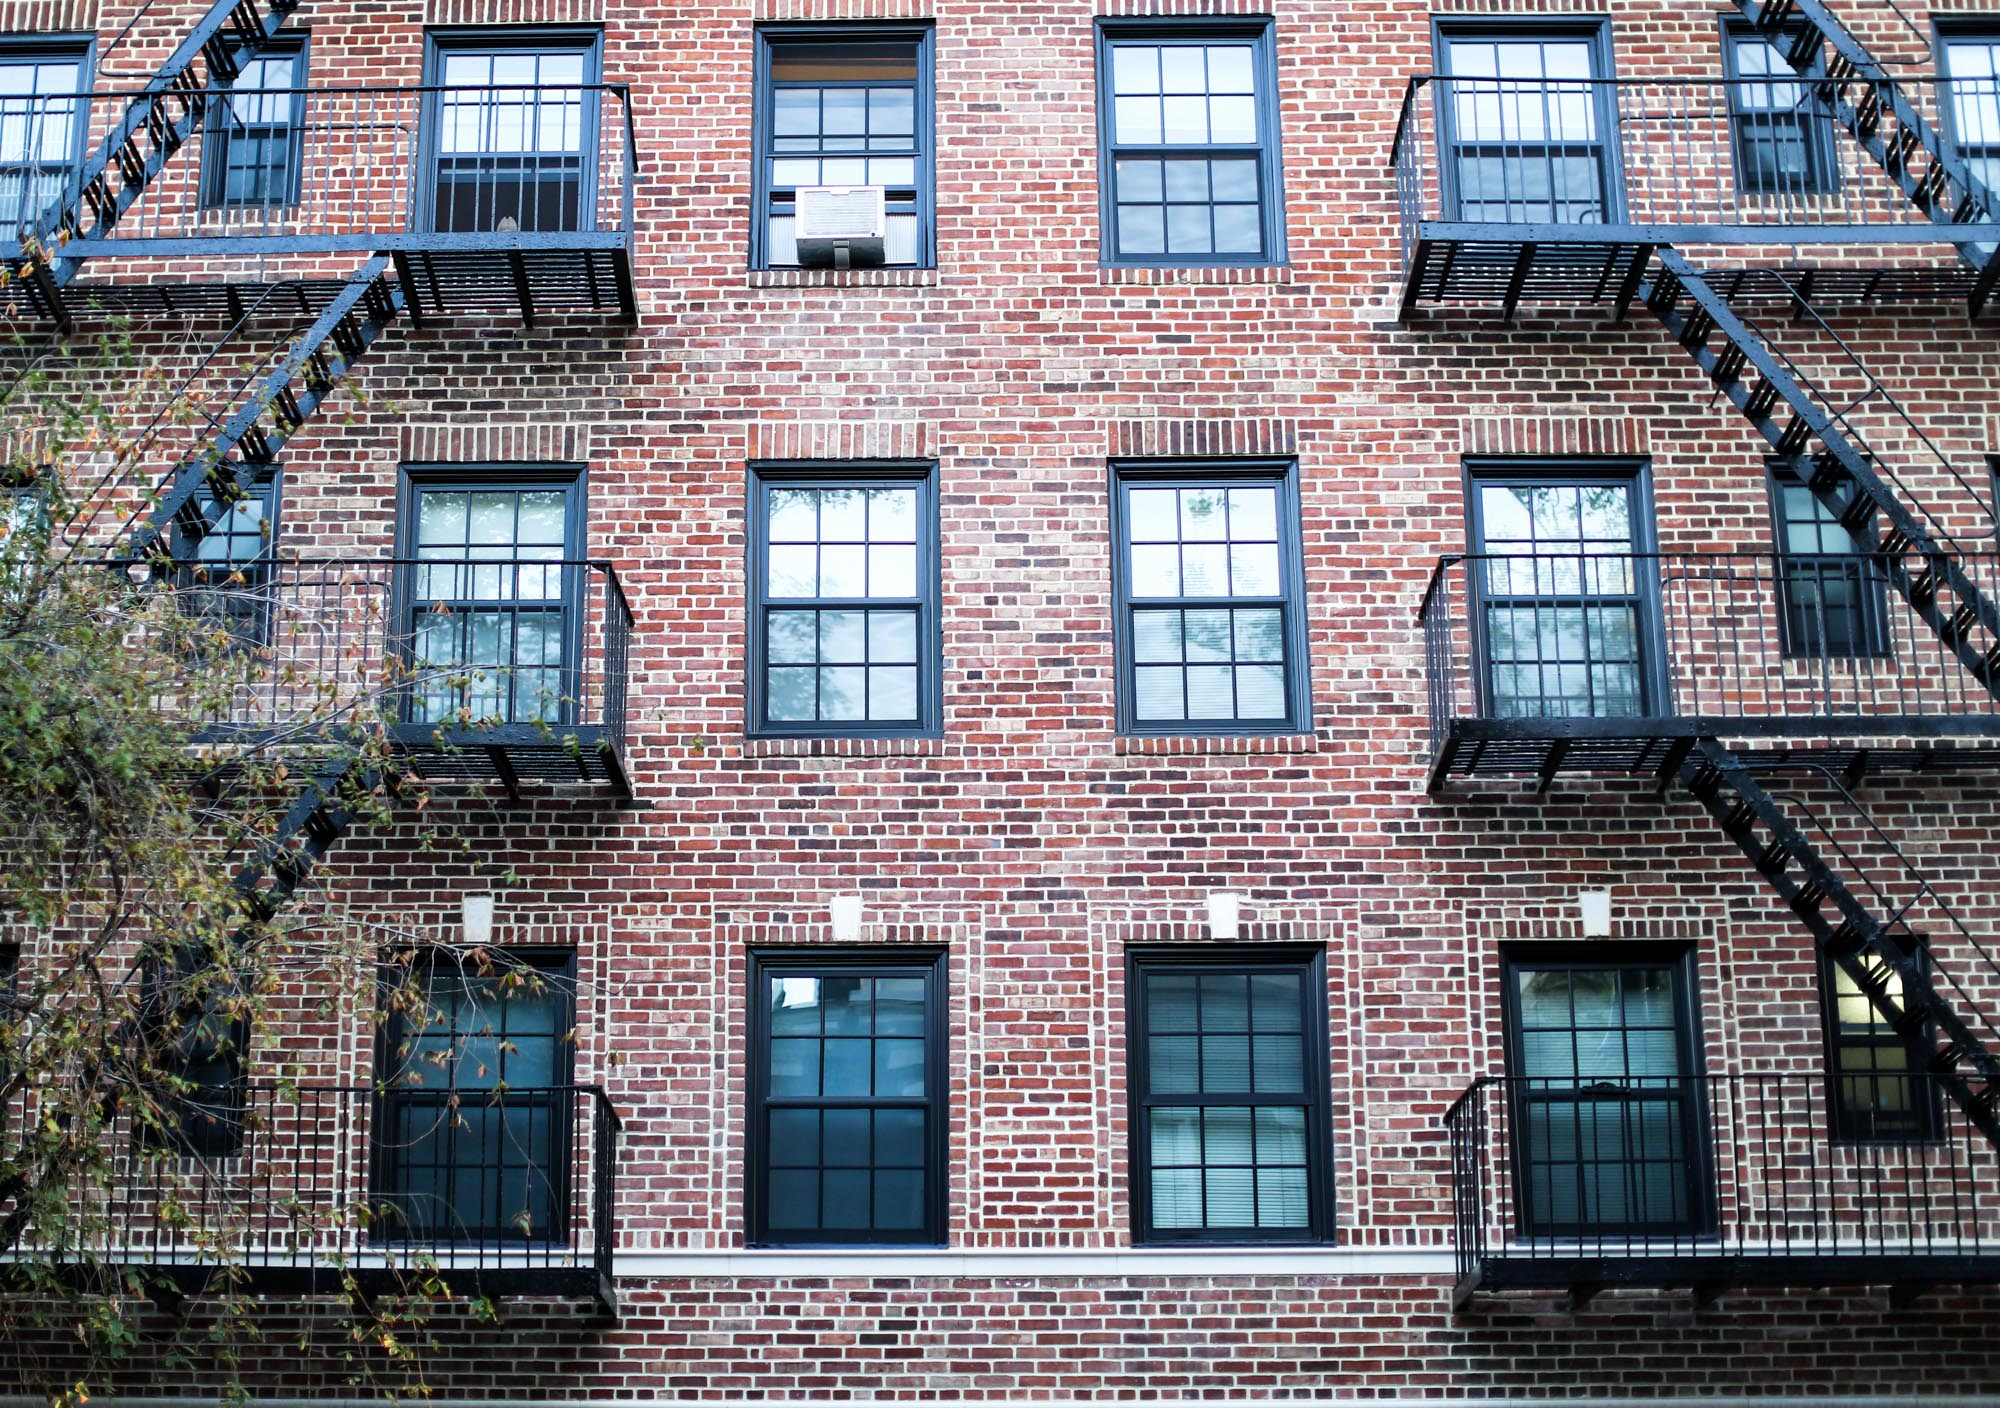 Clochet_Streetstyle_newyork_levis501_vintage_larssonjennings_saxon_watch-21